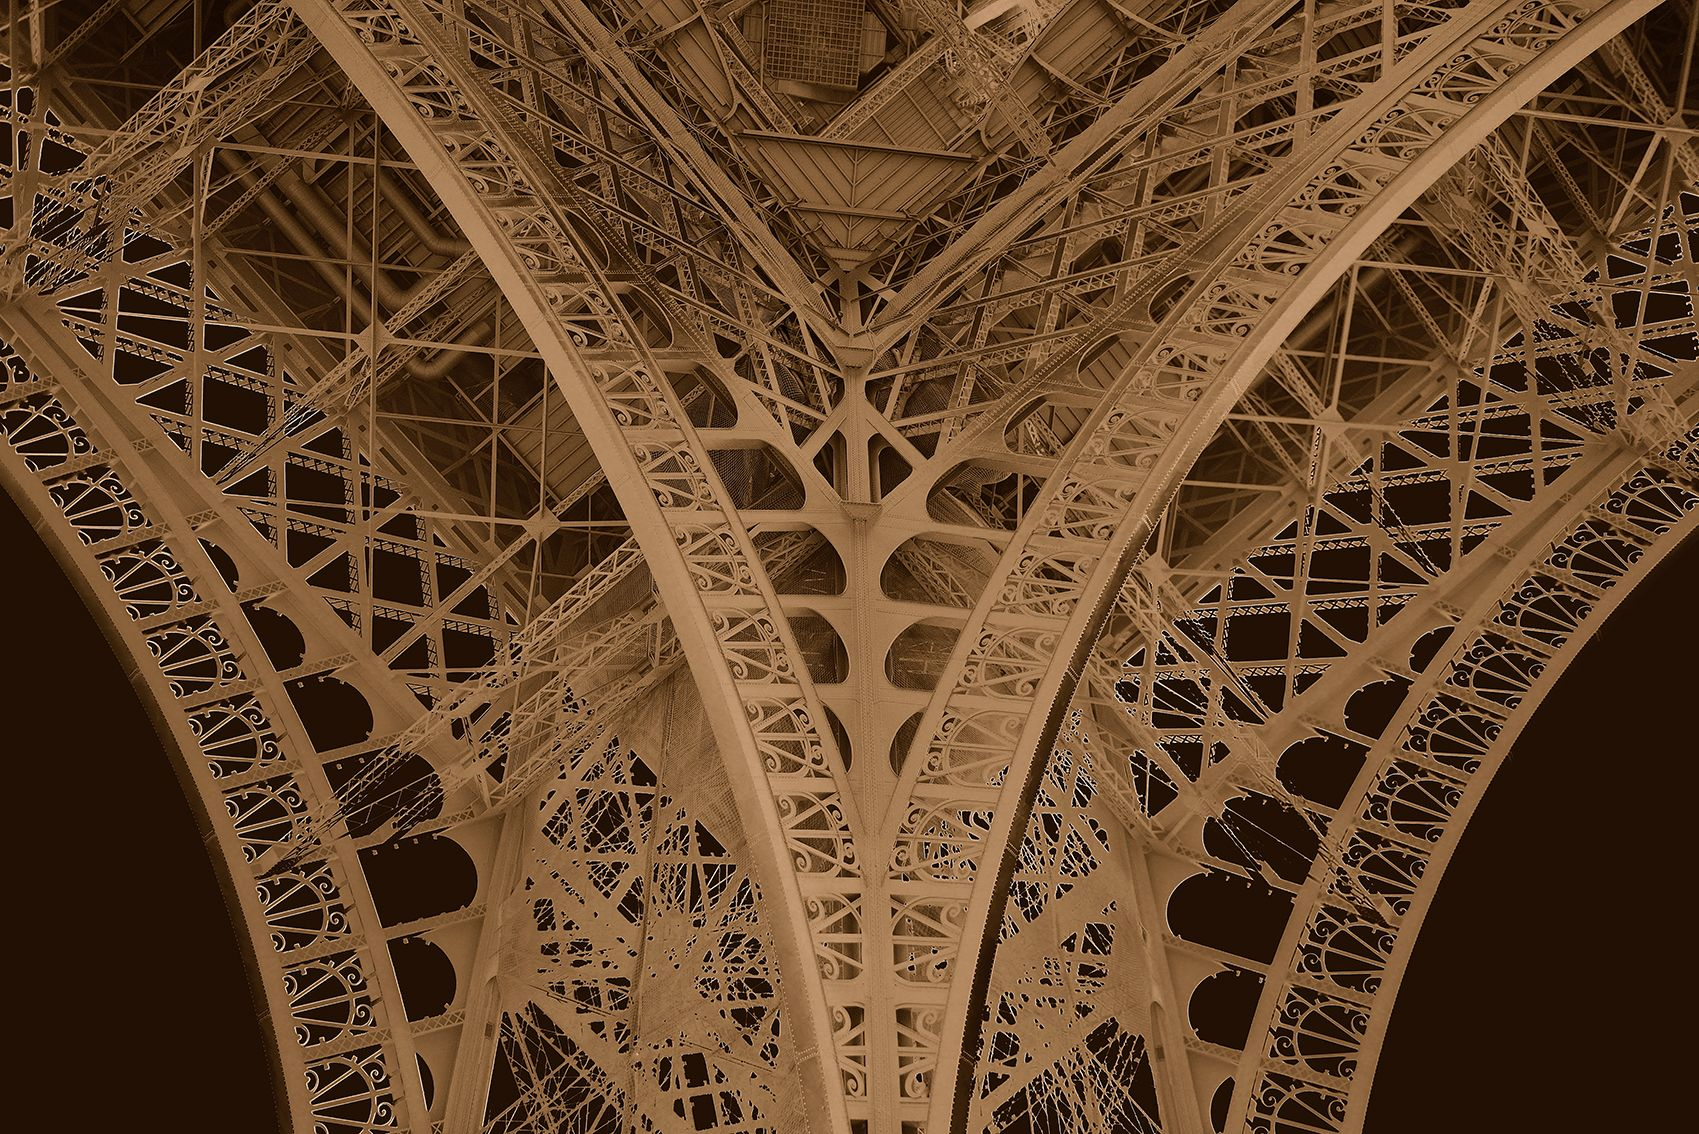 GALERIE - L'Oeil du Prince | Galerie d'Art Figuratif • PARIS